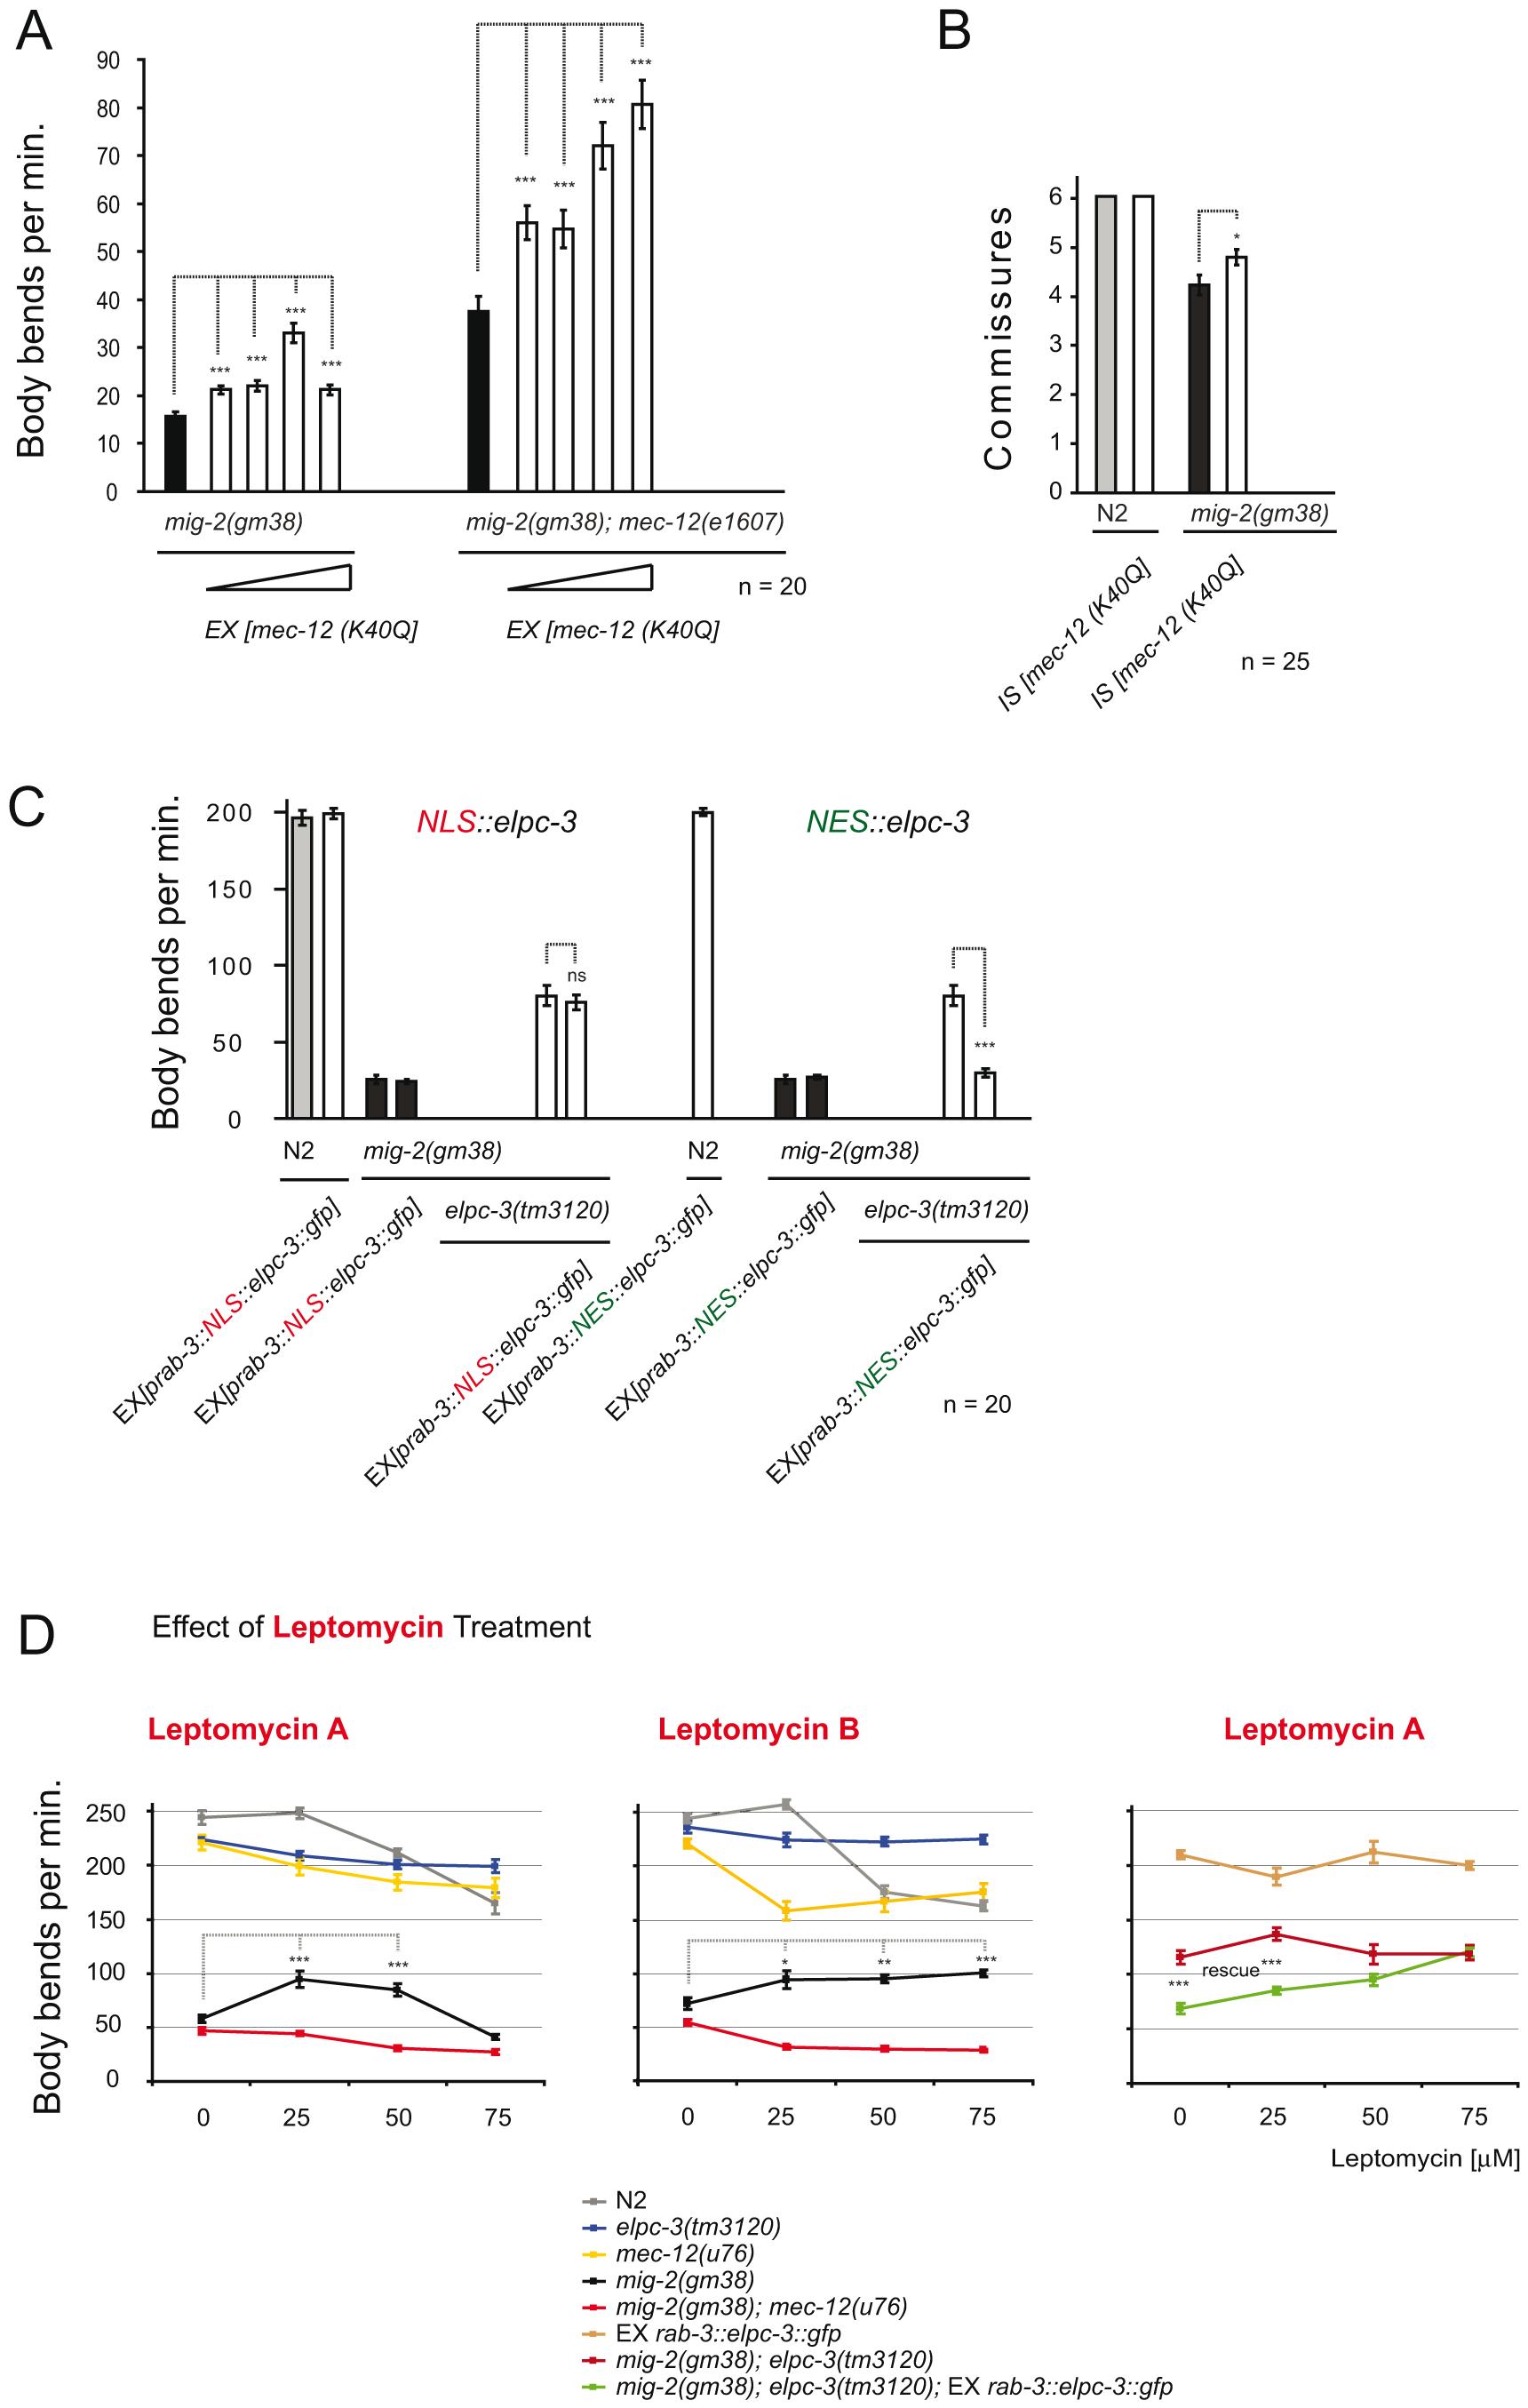 Effects of <i>mec-12</i>/<i>α-tubulin</i>[K40Q] and cytoplasmic requirement of ELPC-3.